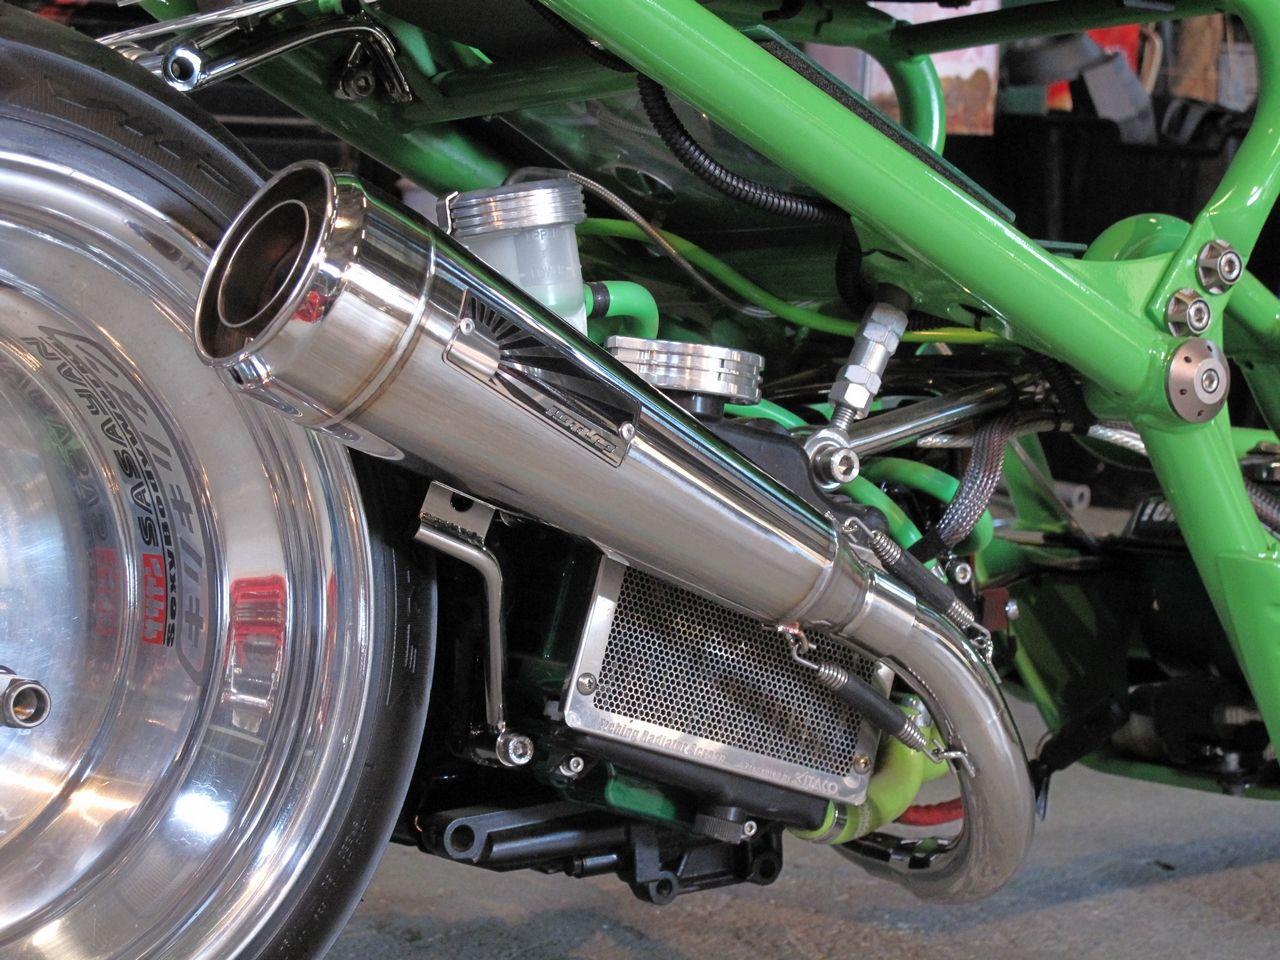 【HOT LAP】Sidewinder 全段排氣管 Type 1